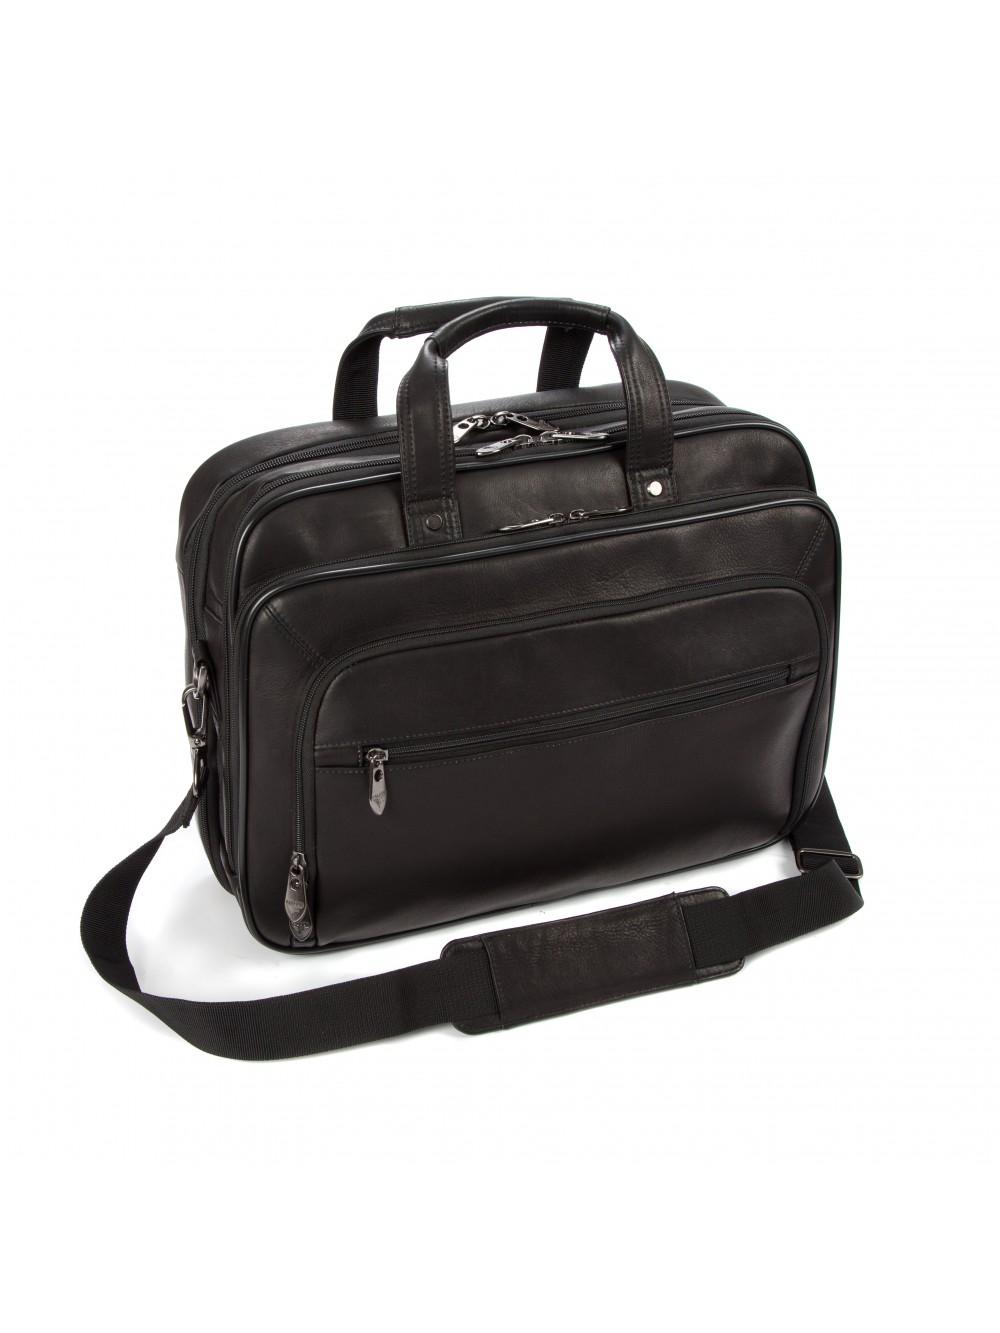 "Falcon Colombian Leather 15.6"" Laptop Briefcase - FI6703 Black"